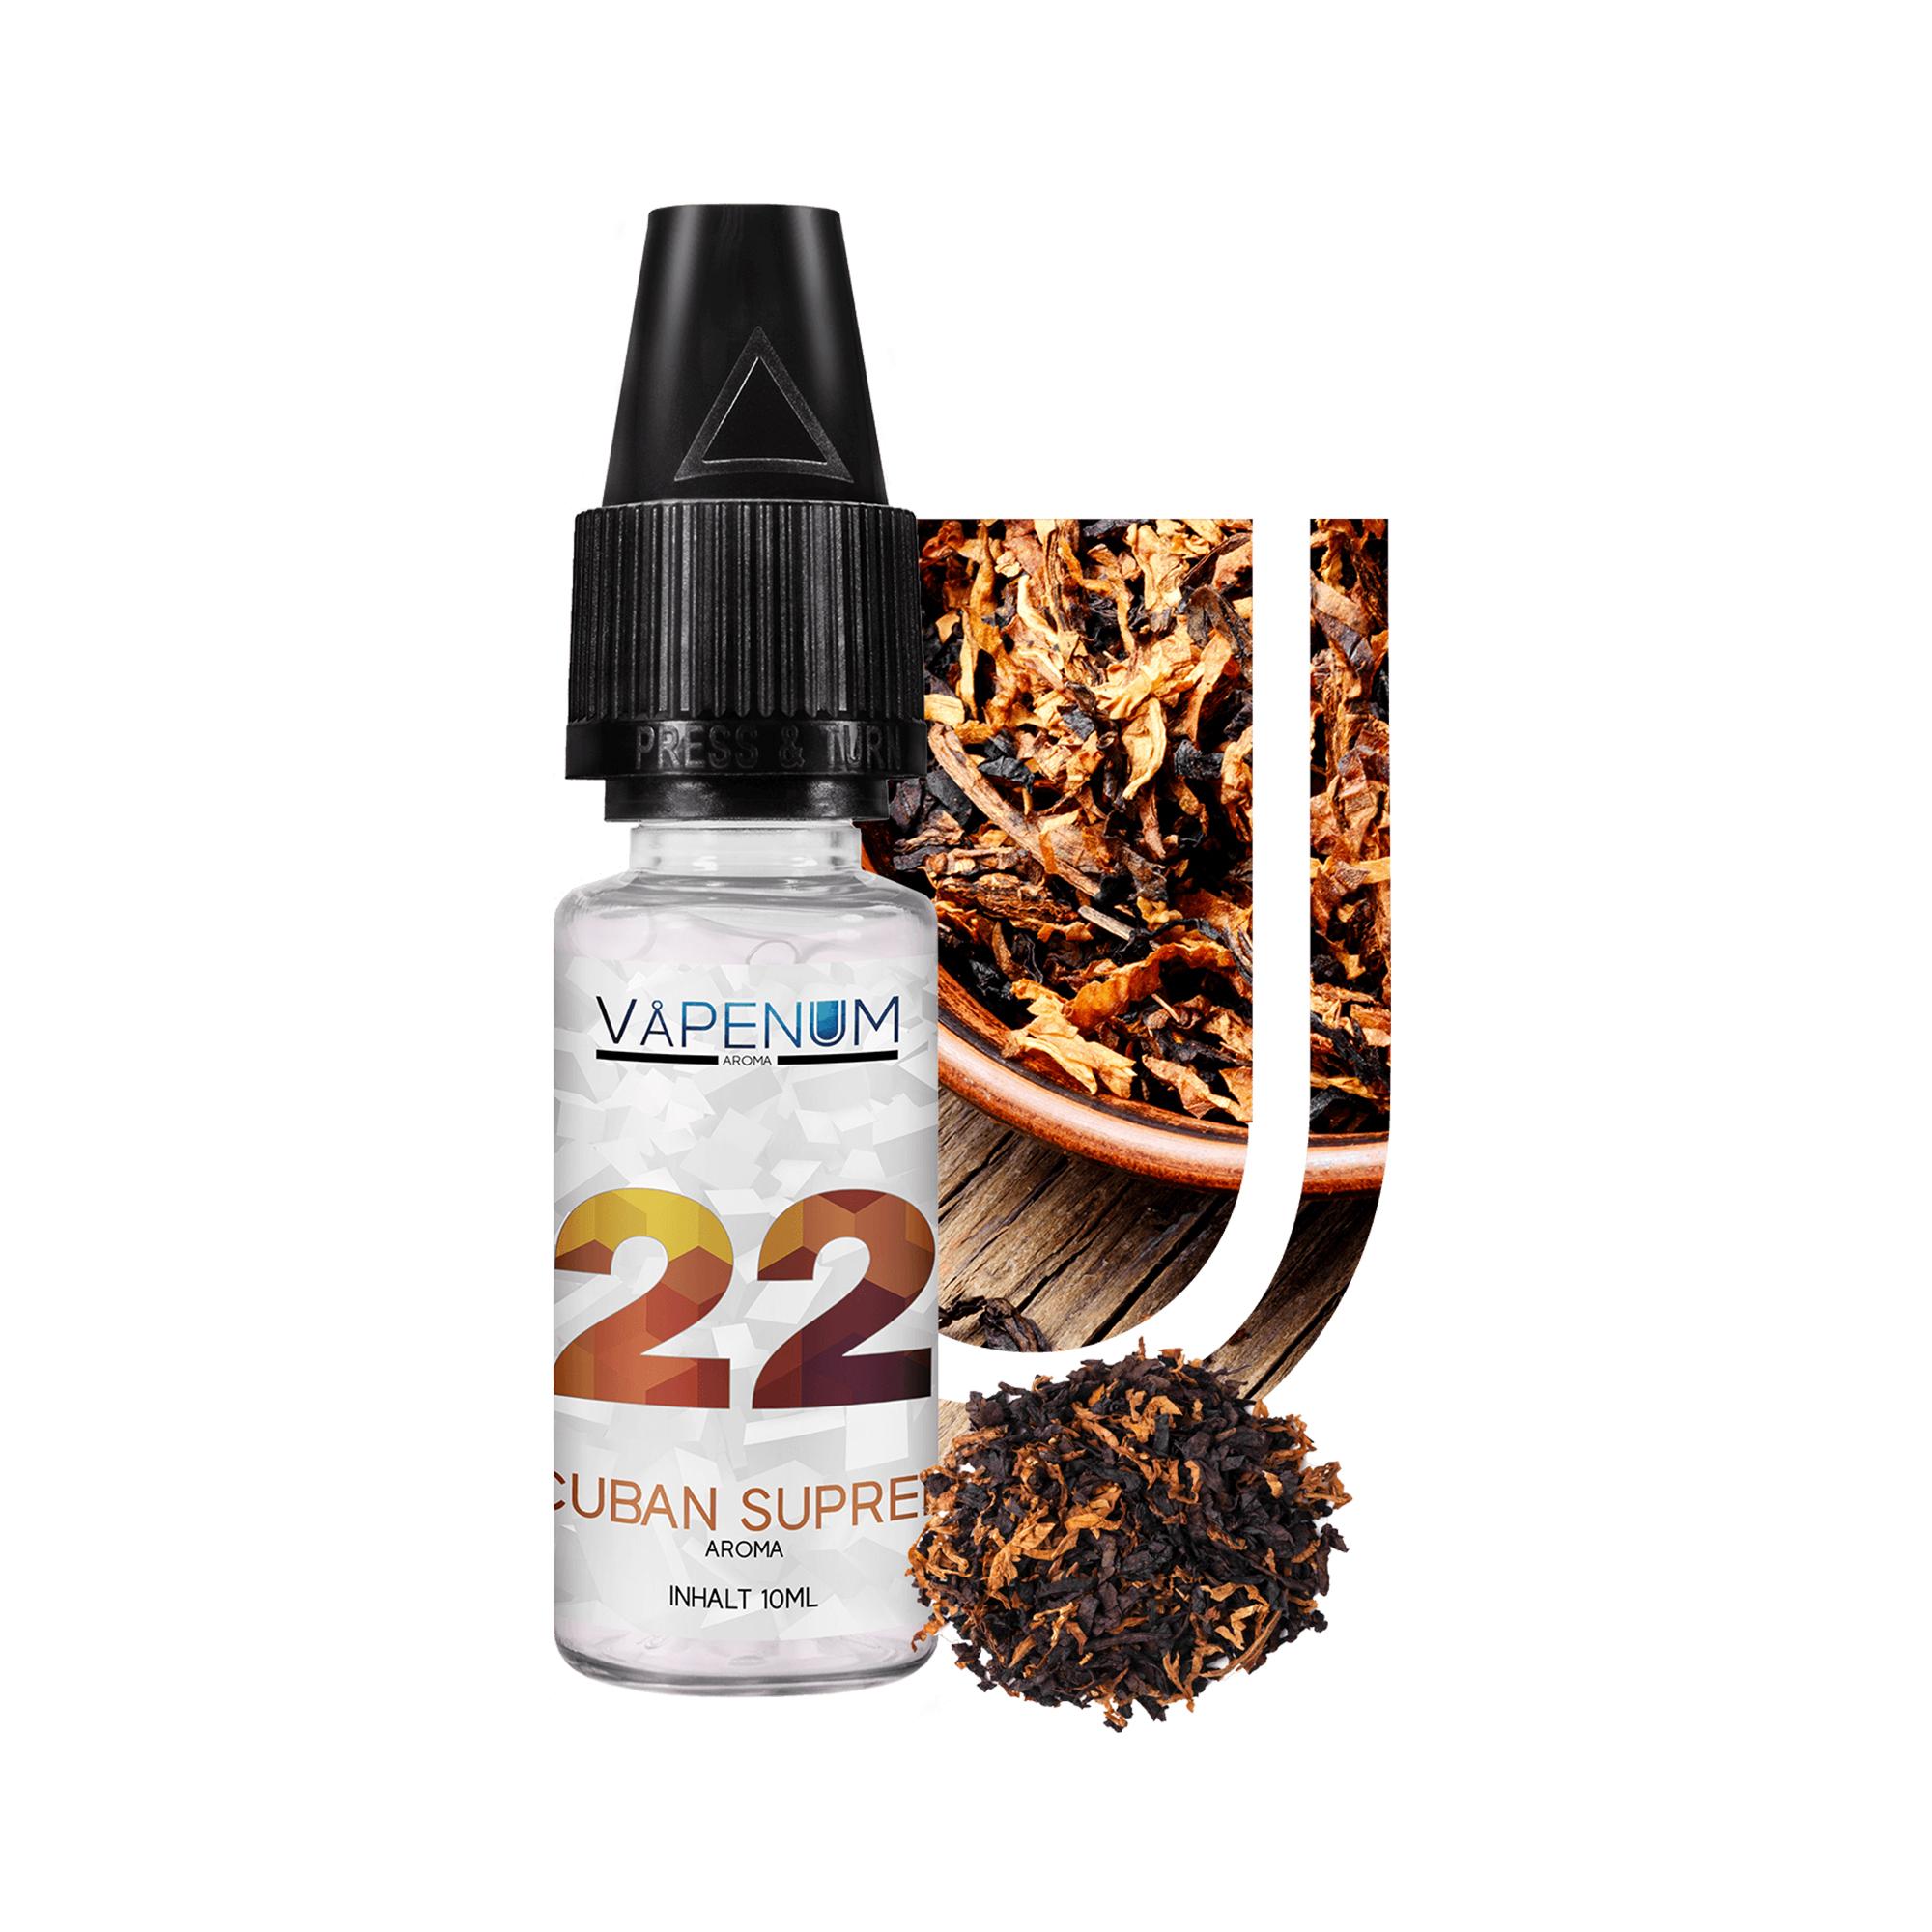 22 - Cuban Supreme Aroma by Vapenum